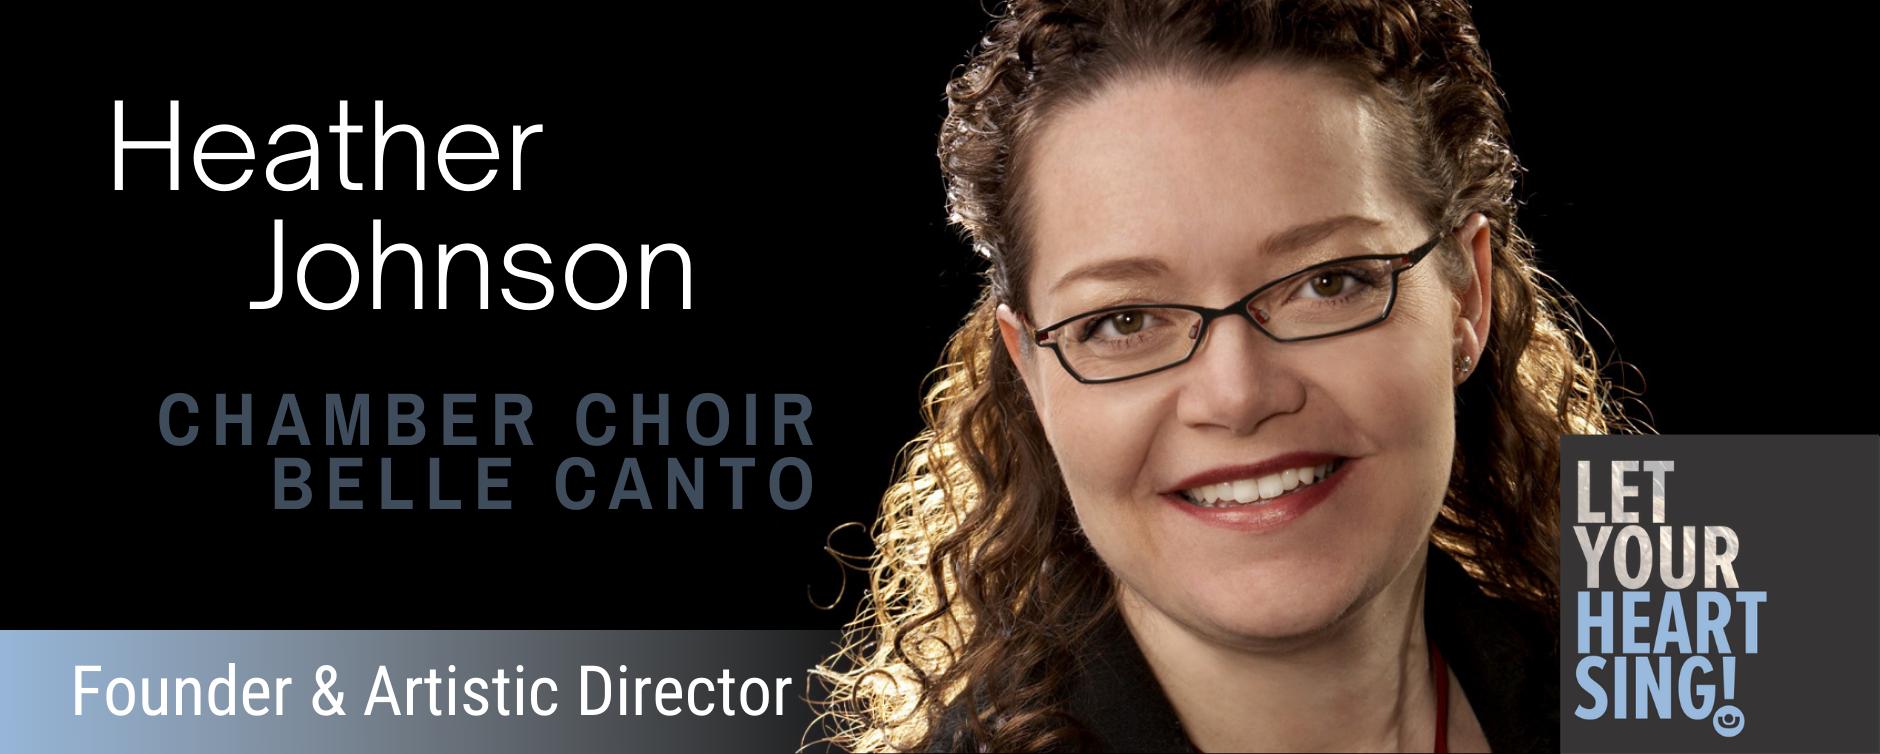 Heather Johnson - Founder & Artistic Director